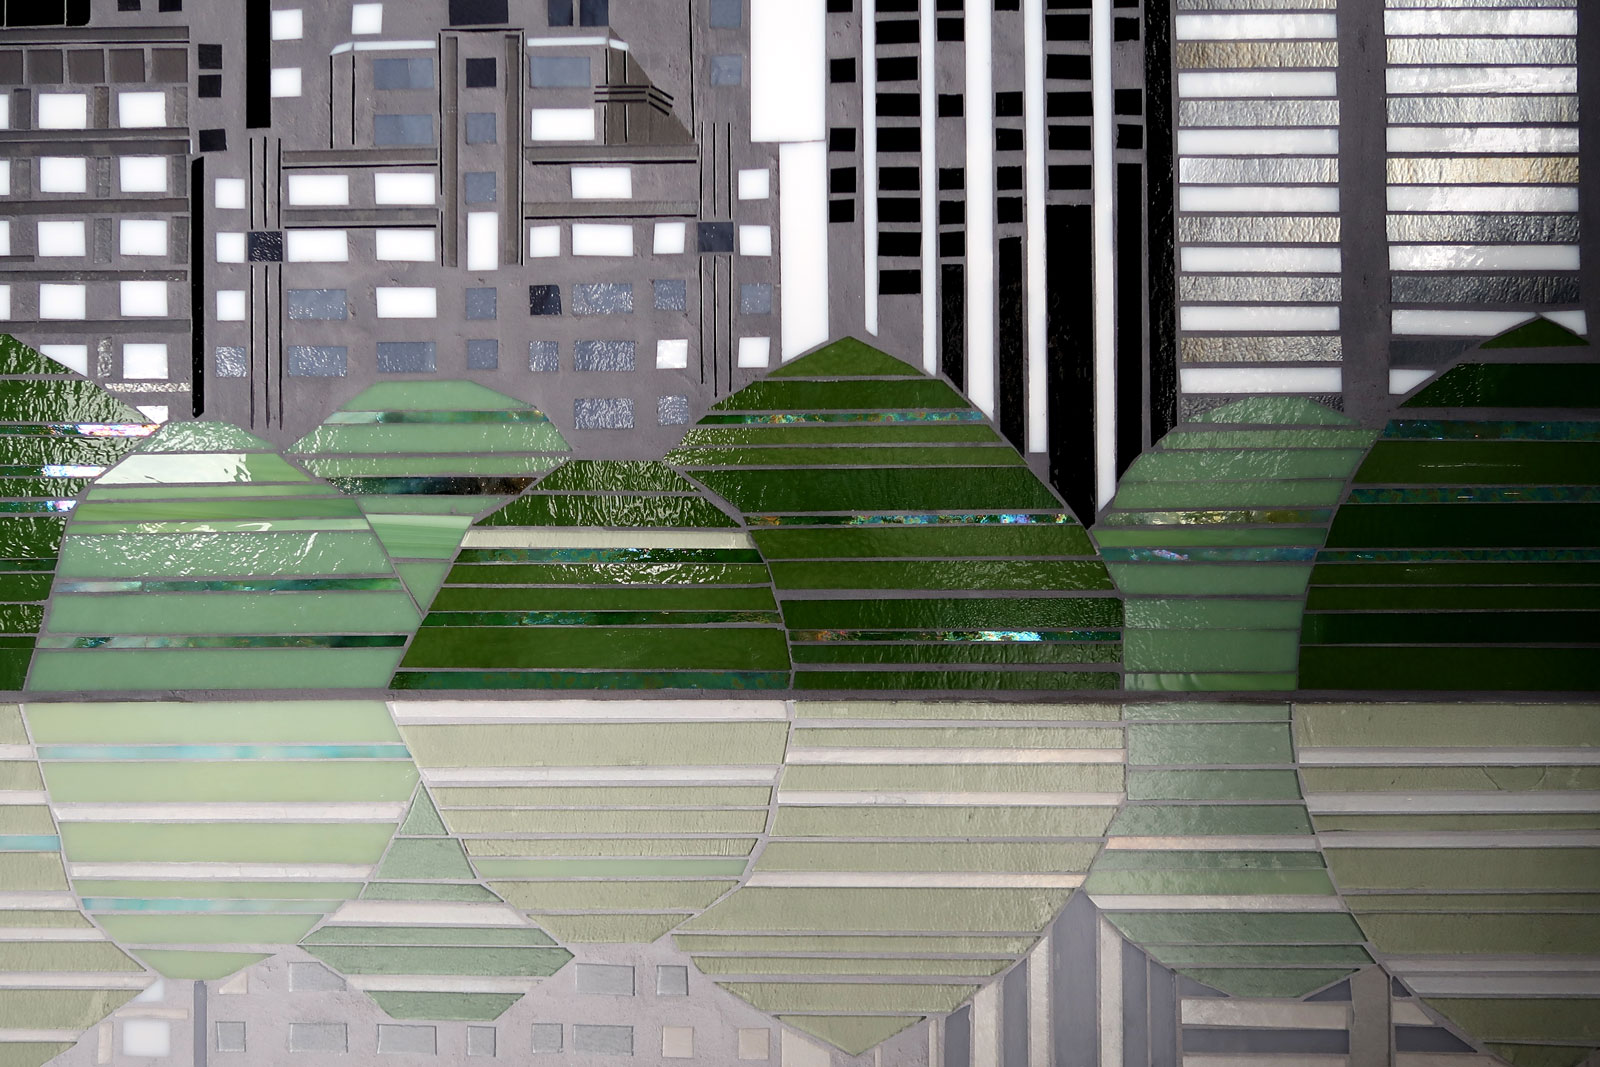 CITYscape NYC